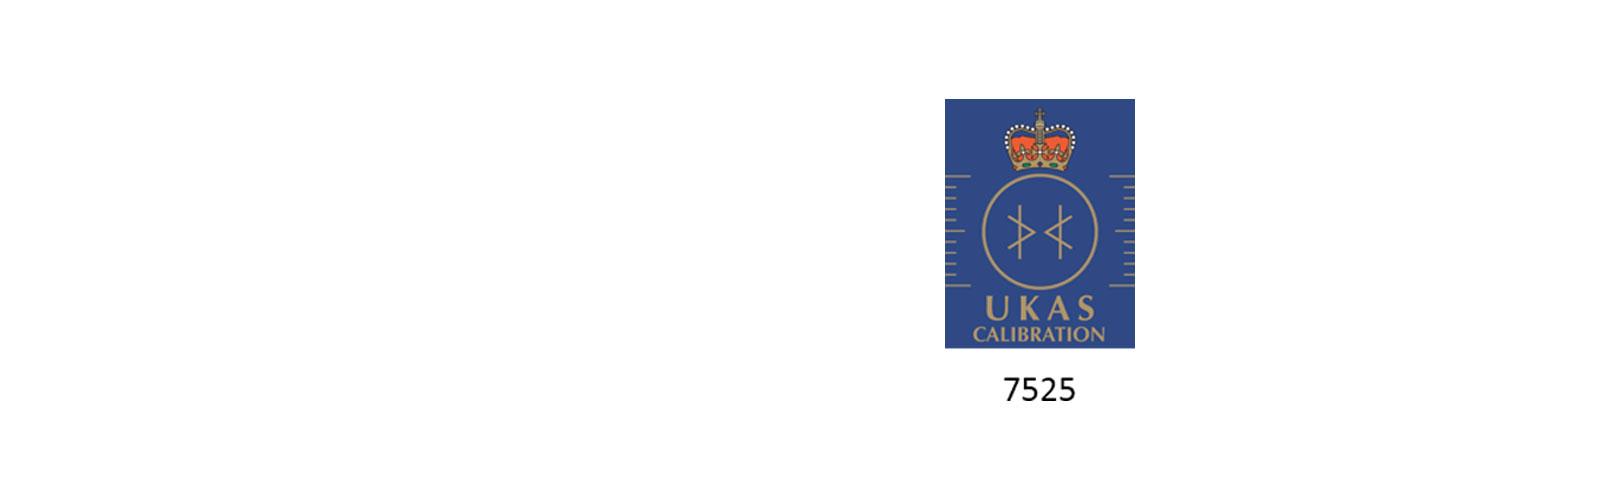 Certifications UKAS